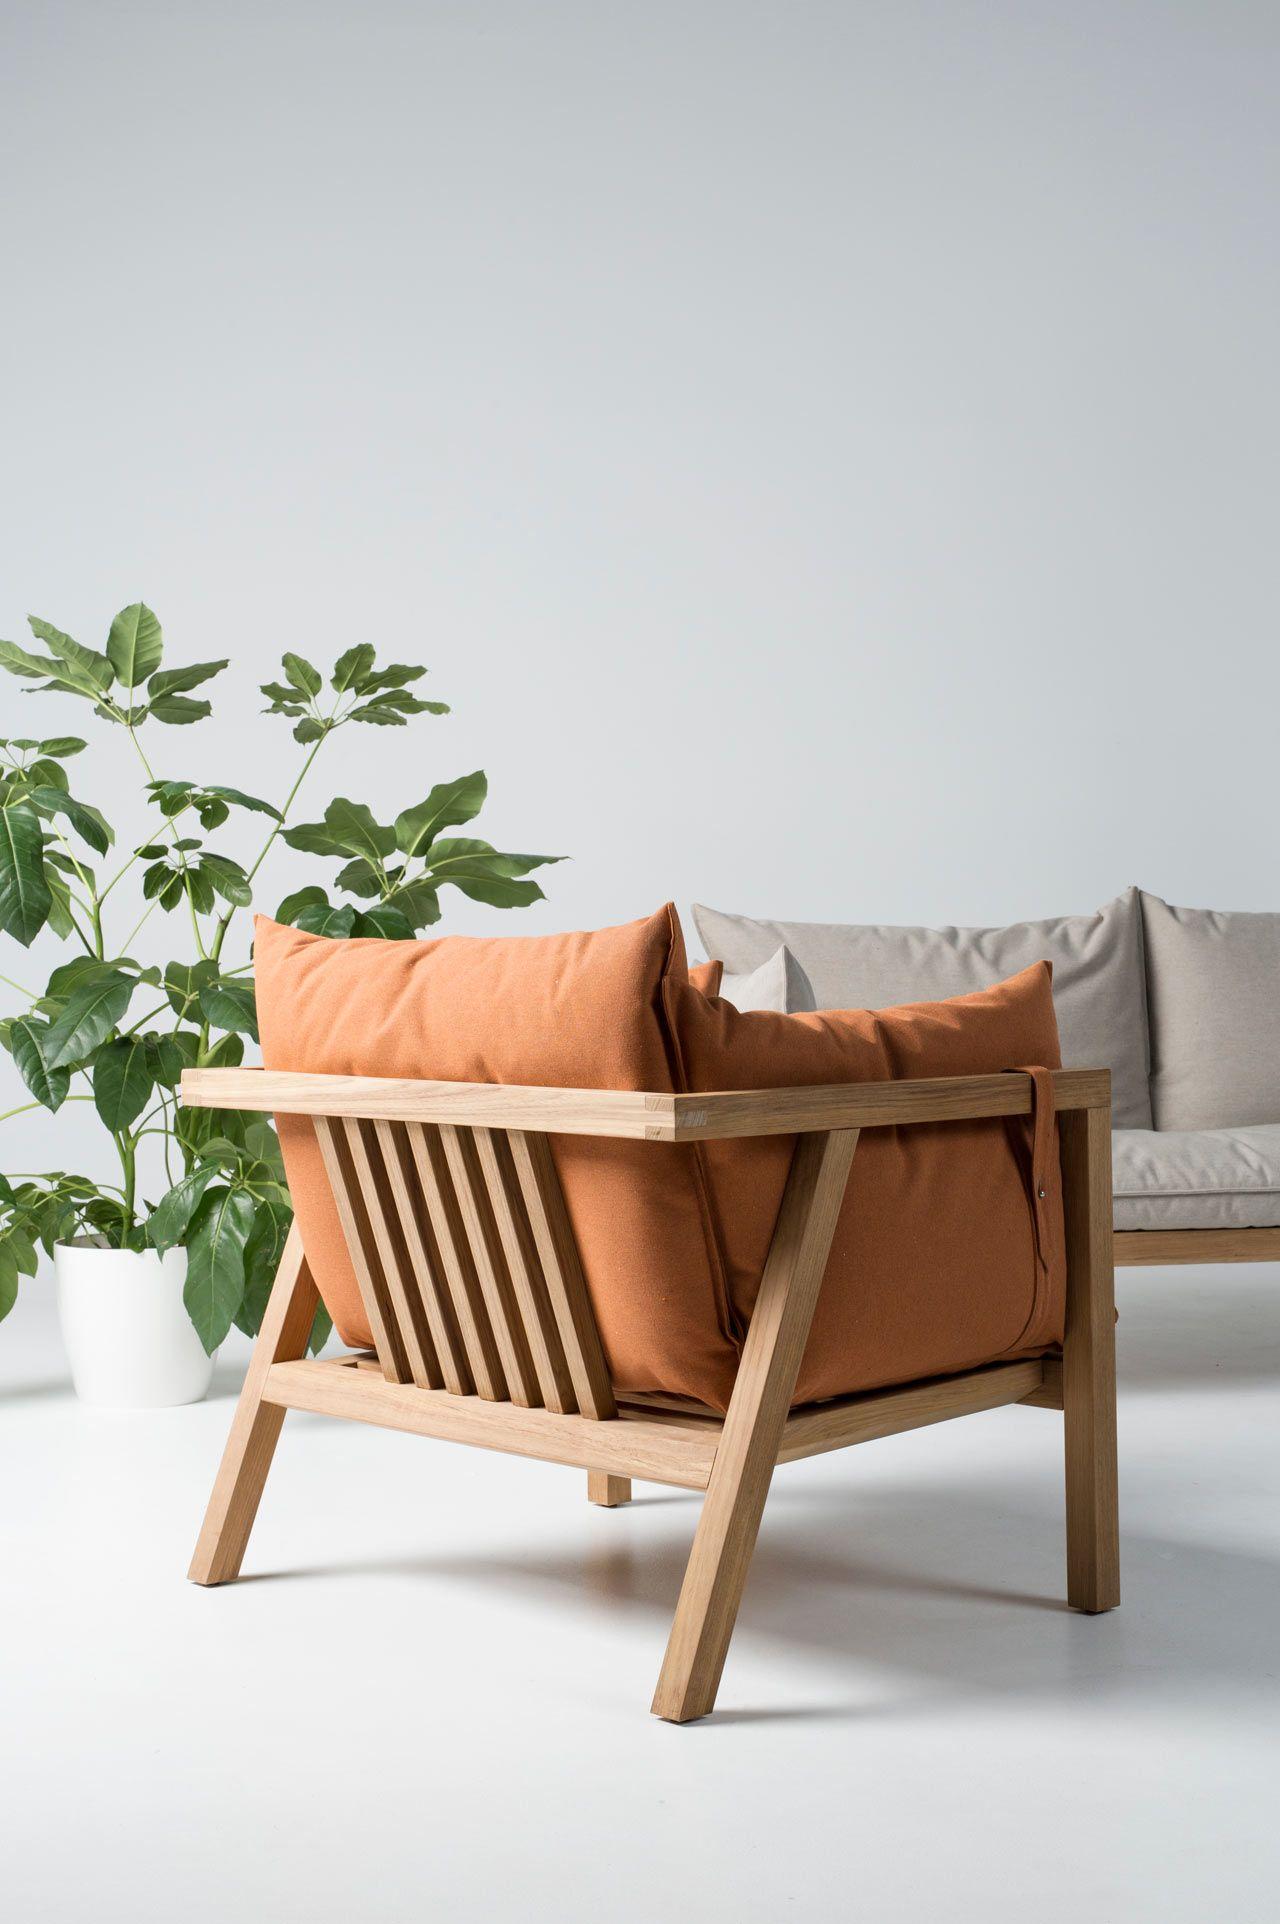 Umomoku: A Comfortable Outdoor Furniture Collection Designed for Lounging - Design Milk